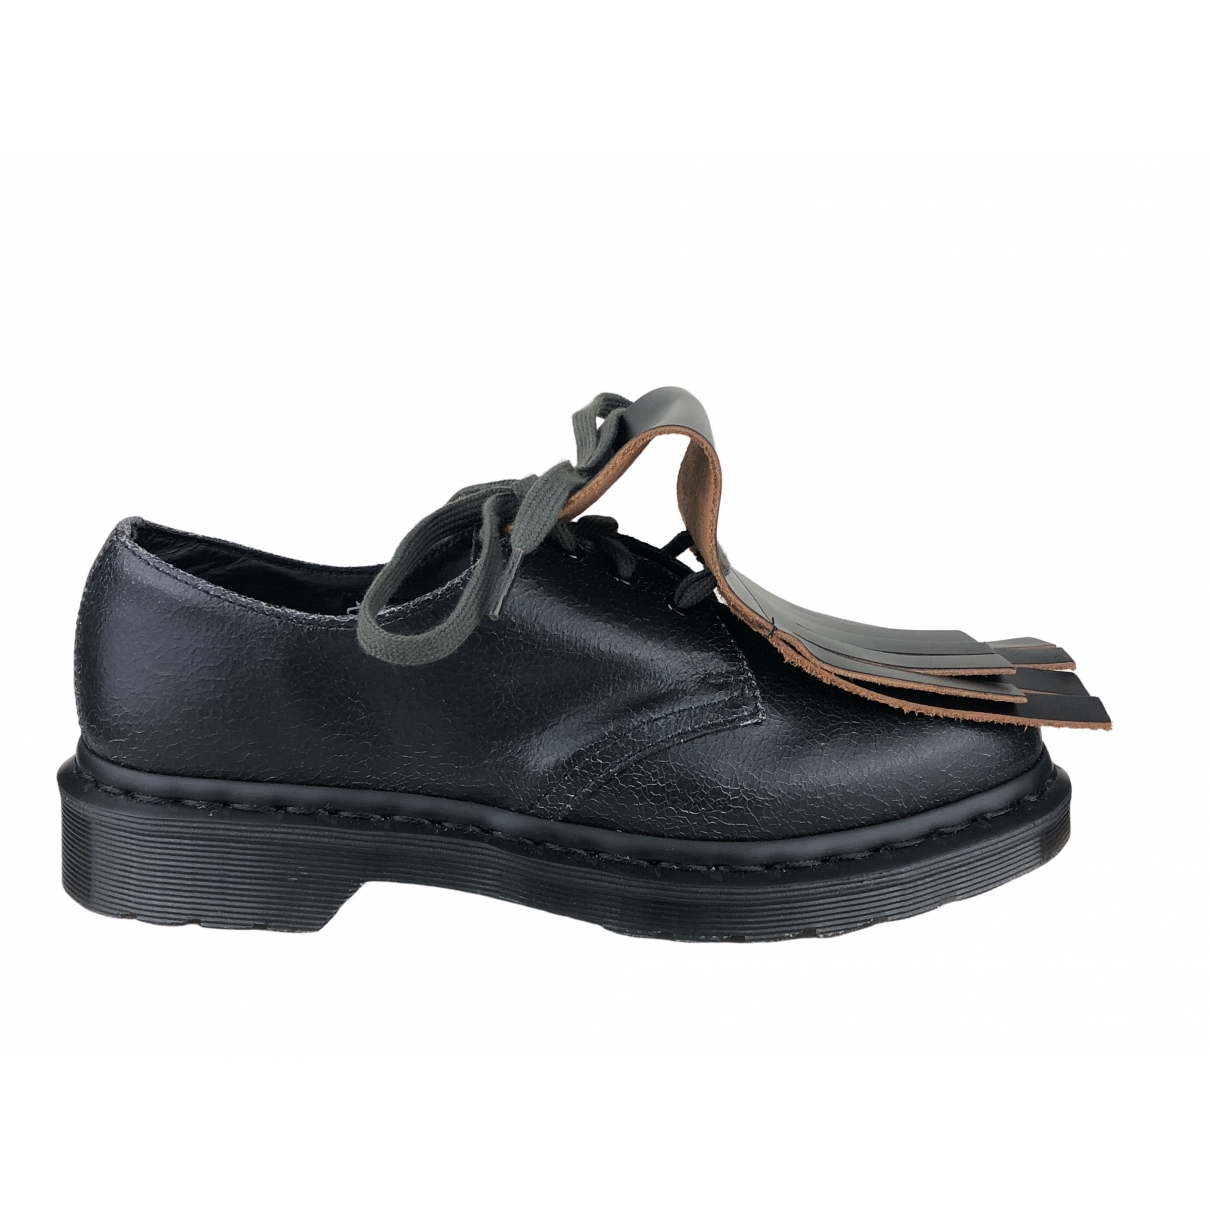 Dr. Martens 1461 (3 eye) Black Leather Lace ups for Women 40 EU